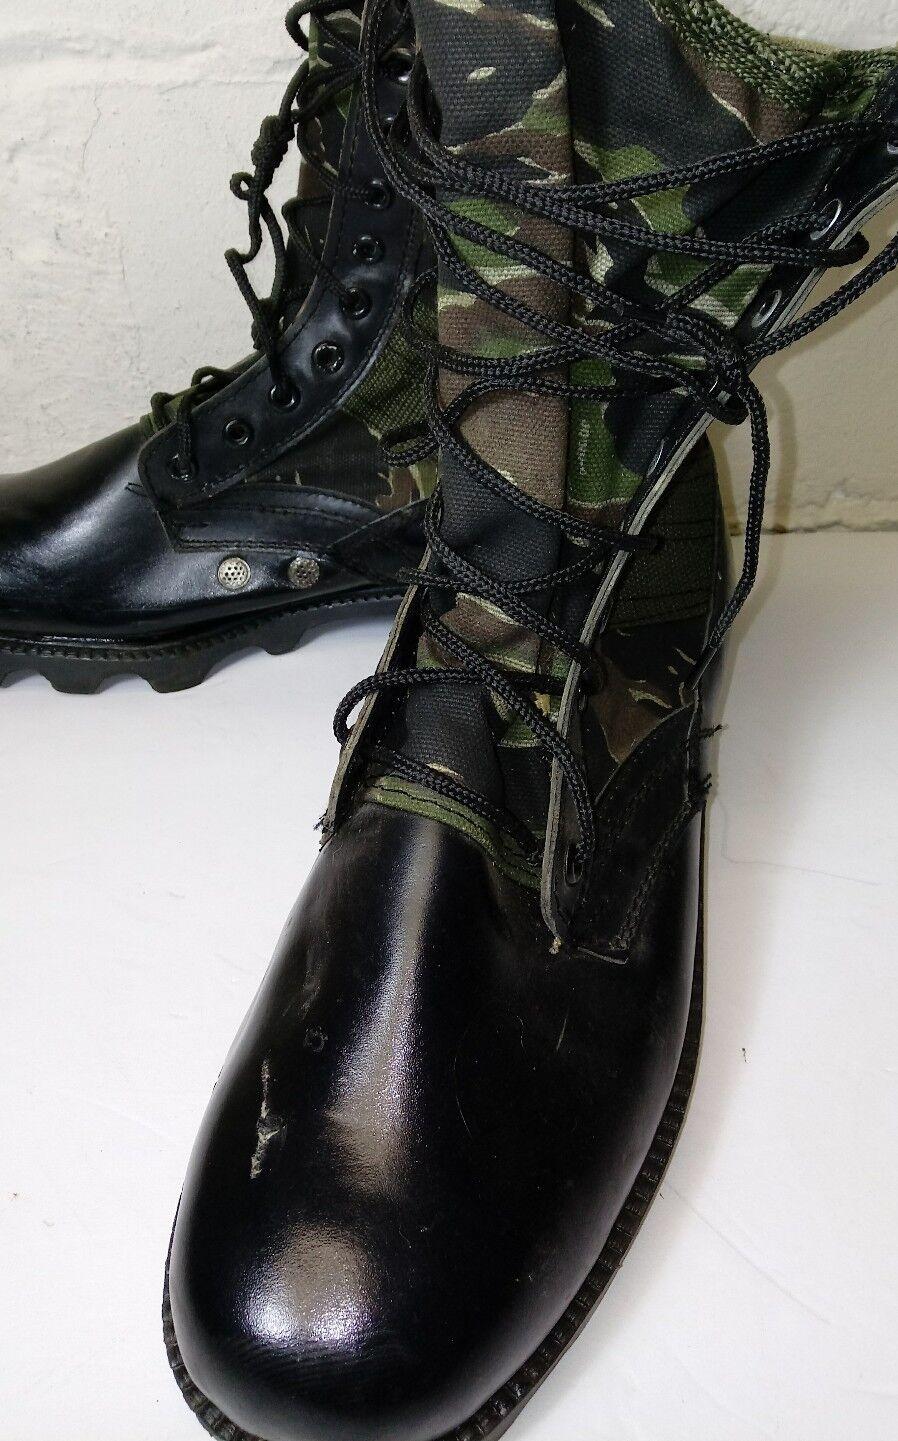 VINTAGE Military Boots size 11 W Men's Leather Black Camo......Multi-Color......